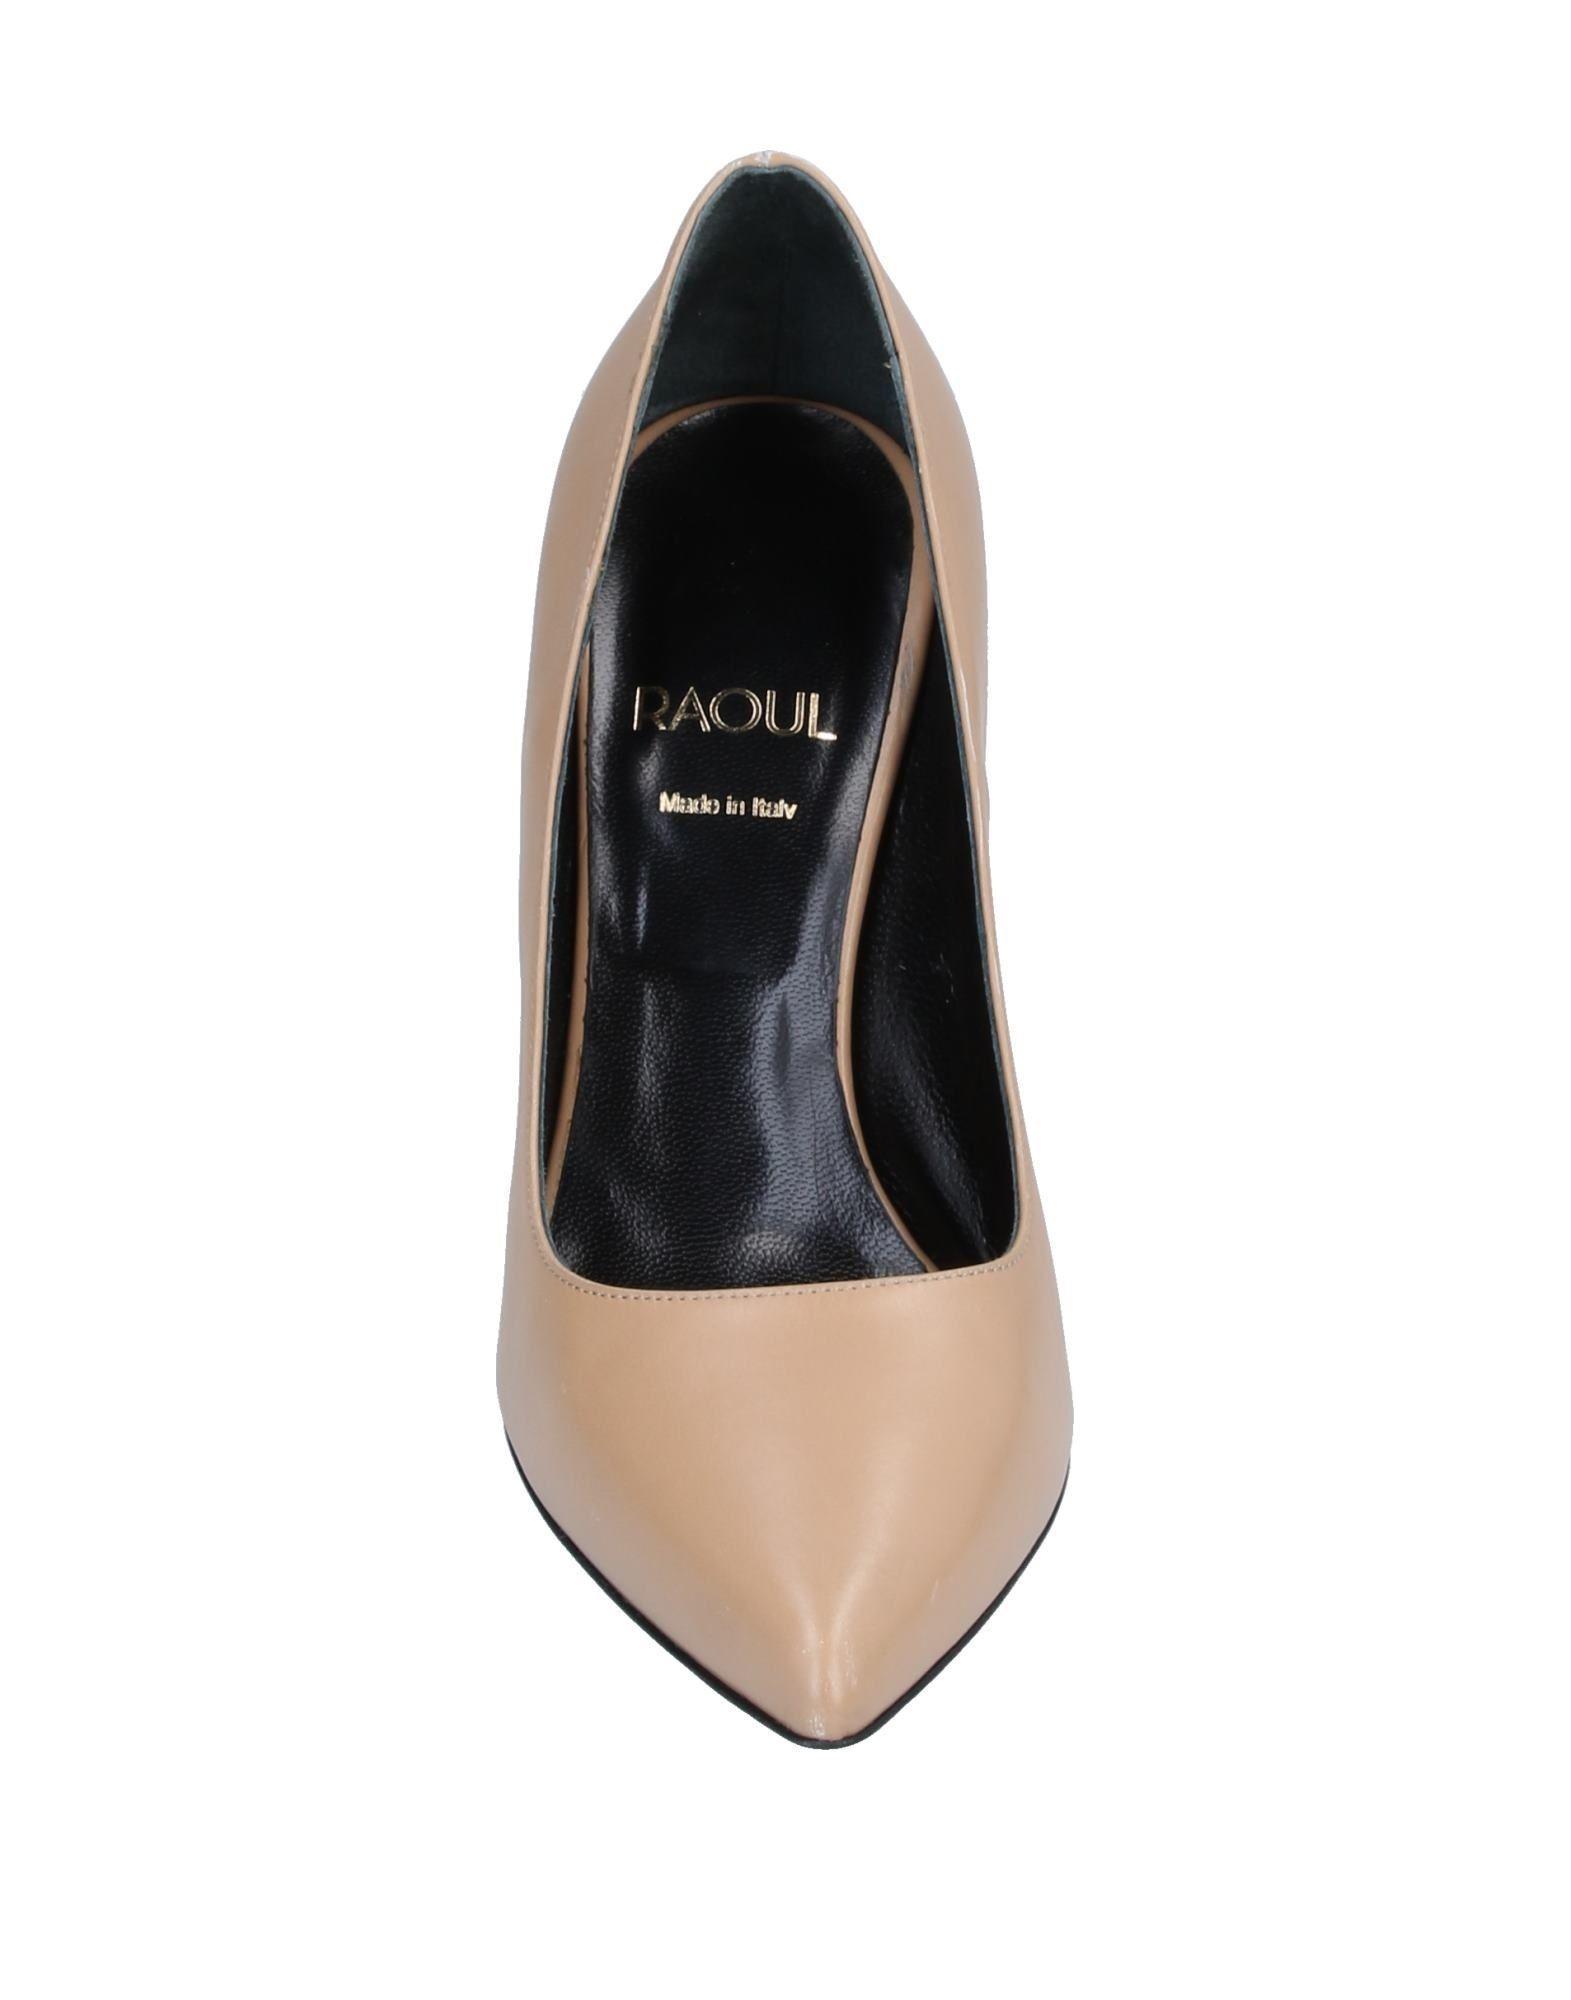 Zapatos de salón Raoul de Cuero de color Neutro